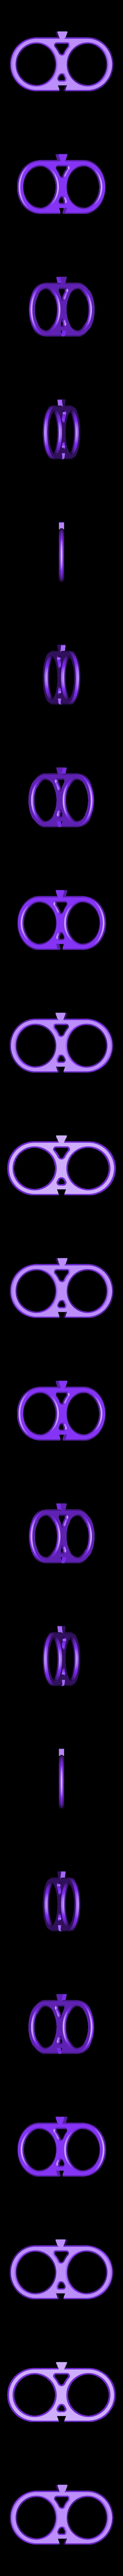 cercle_double.stl Download STL file Scarf holder with tie and scarf belt • 3D printable design, Aldebaran